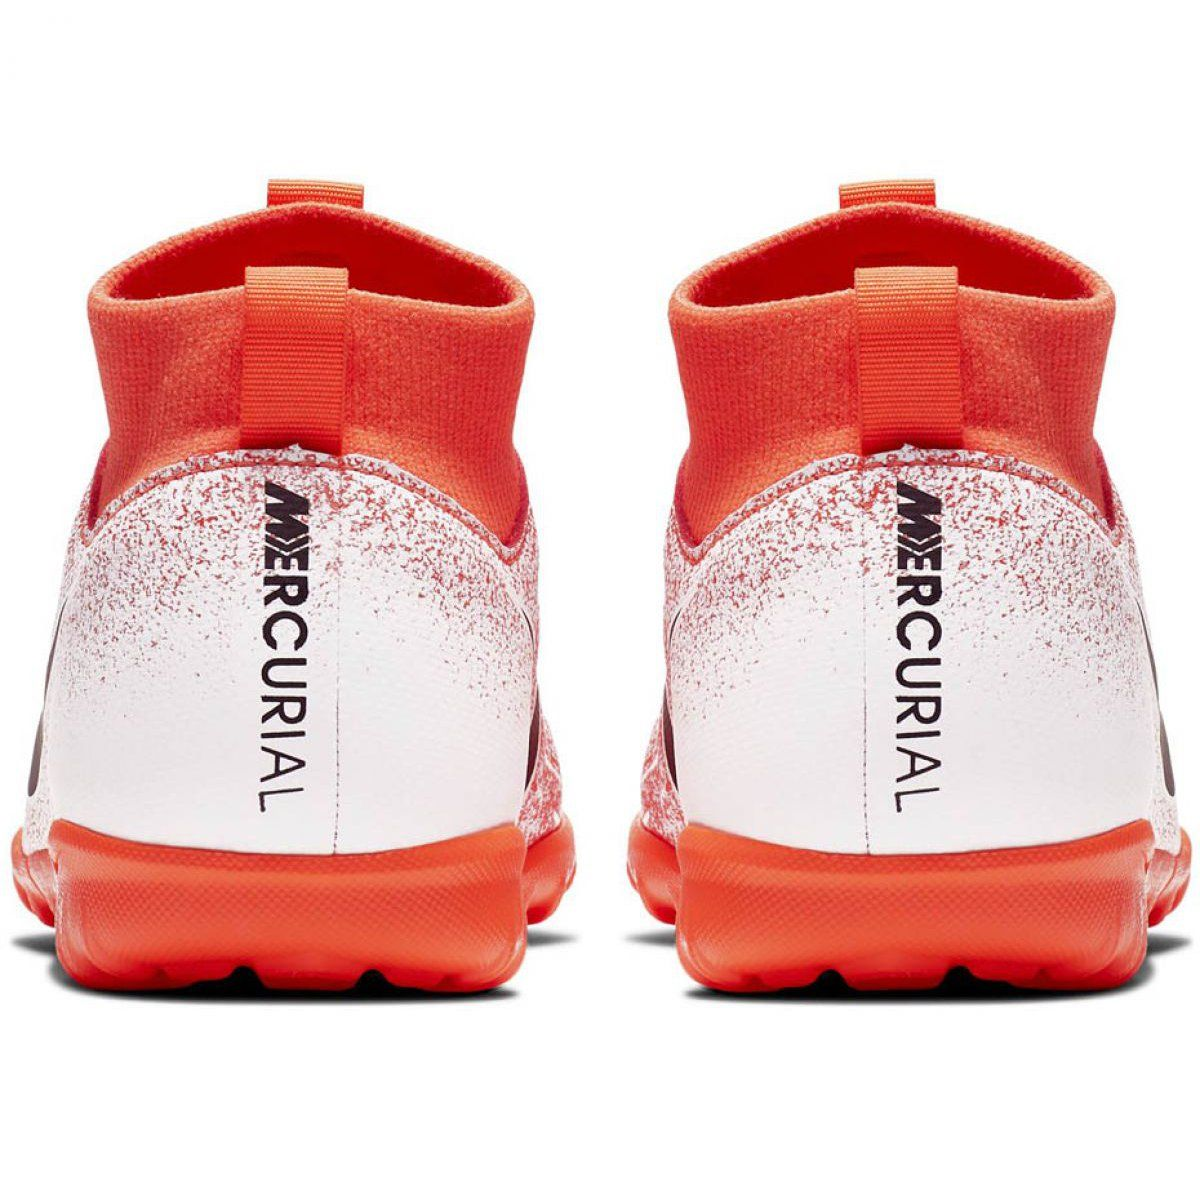 Buty Pilkarskie Nike Mercurial Superfly X 6 Academy Tf Jr Ah7344 801 Pomaranczowe Wielokolorowe Football Boots Superfly Sports Footwear